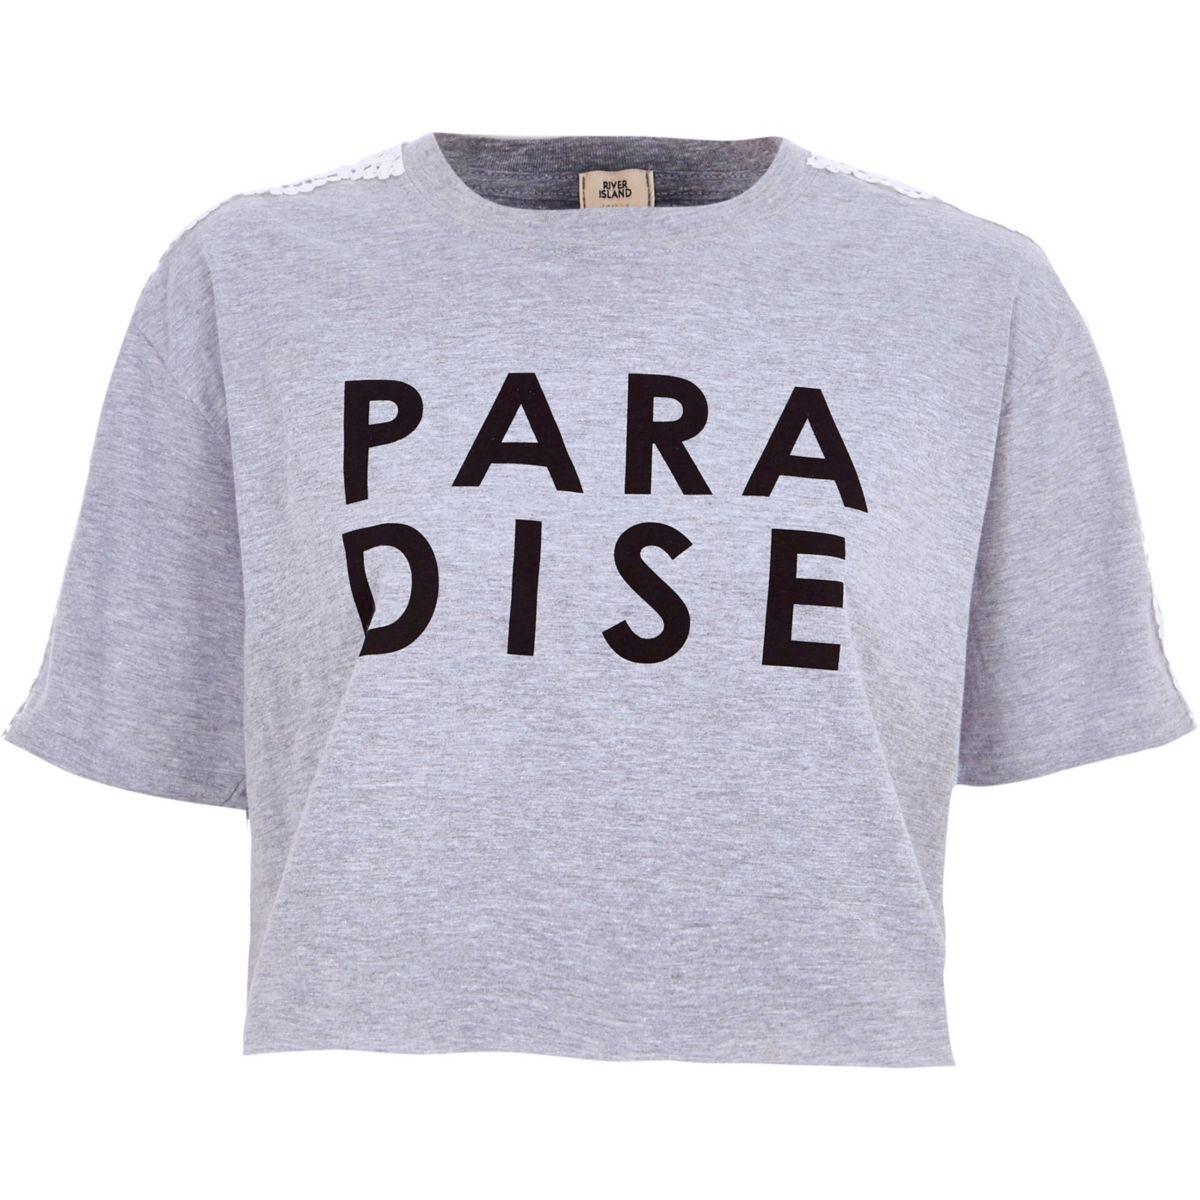 Grey marl 'paradise' print cropped T-shirt